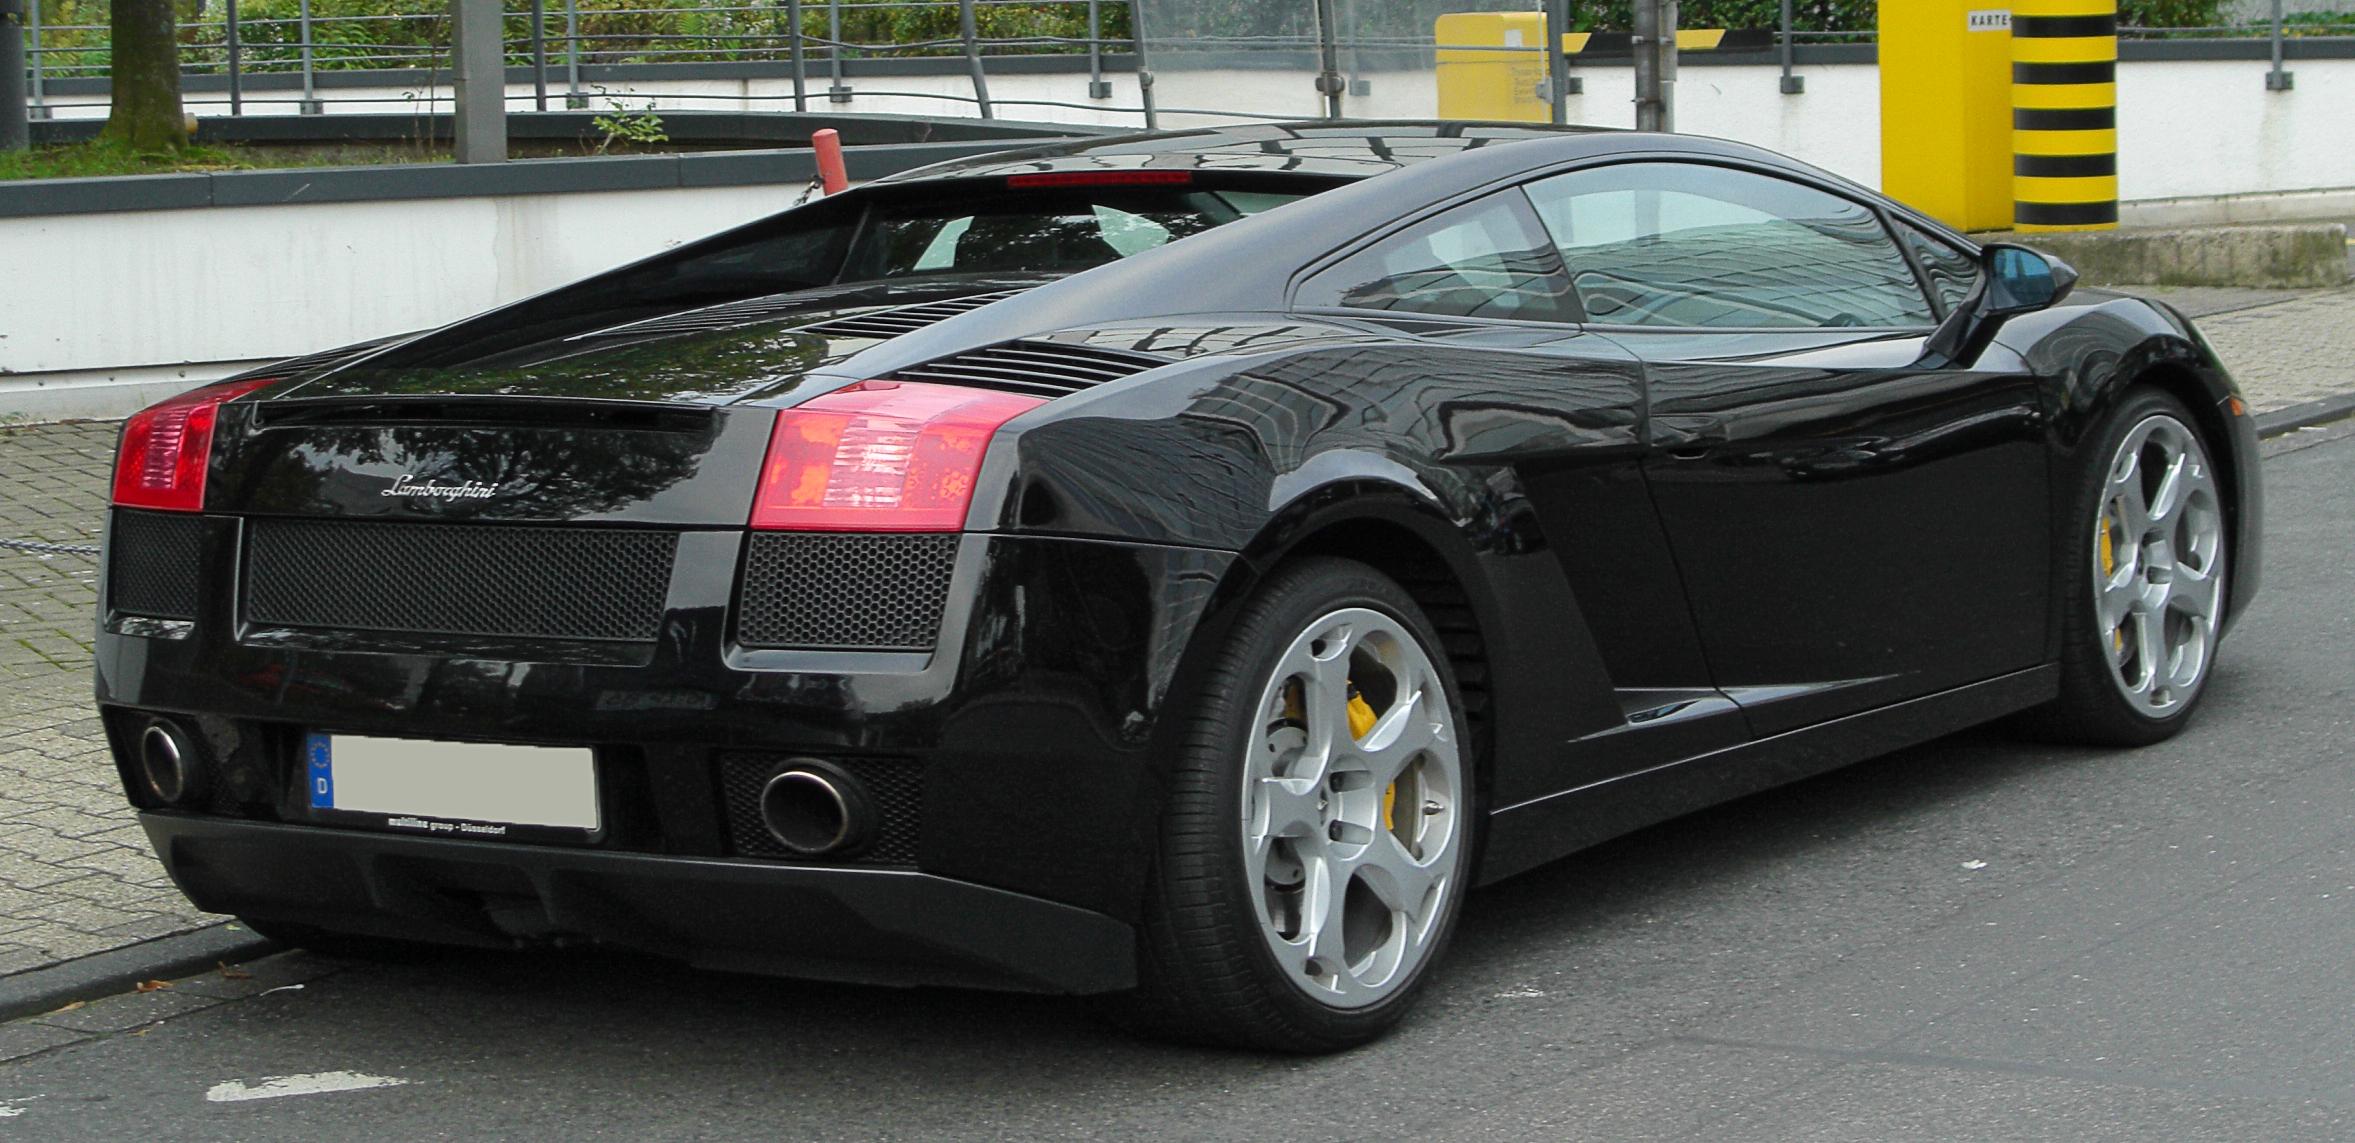 Lamborghini Information >> File:Lamborghini Gallardo Coupé rear 20101002.jpg - Wikimedia Commons